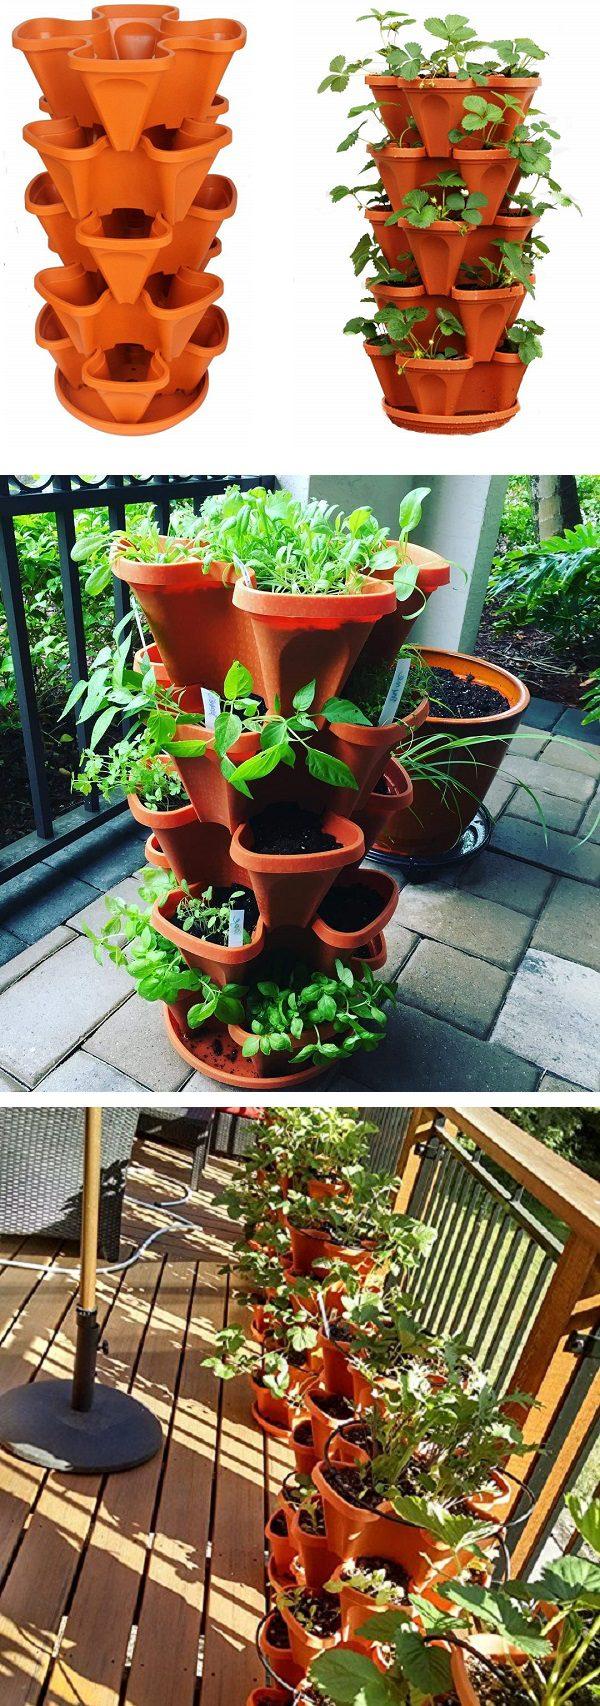 5 stackable strawberries, herbs, flowers and vegetables